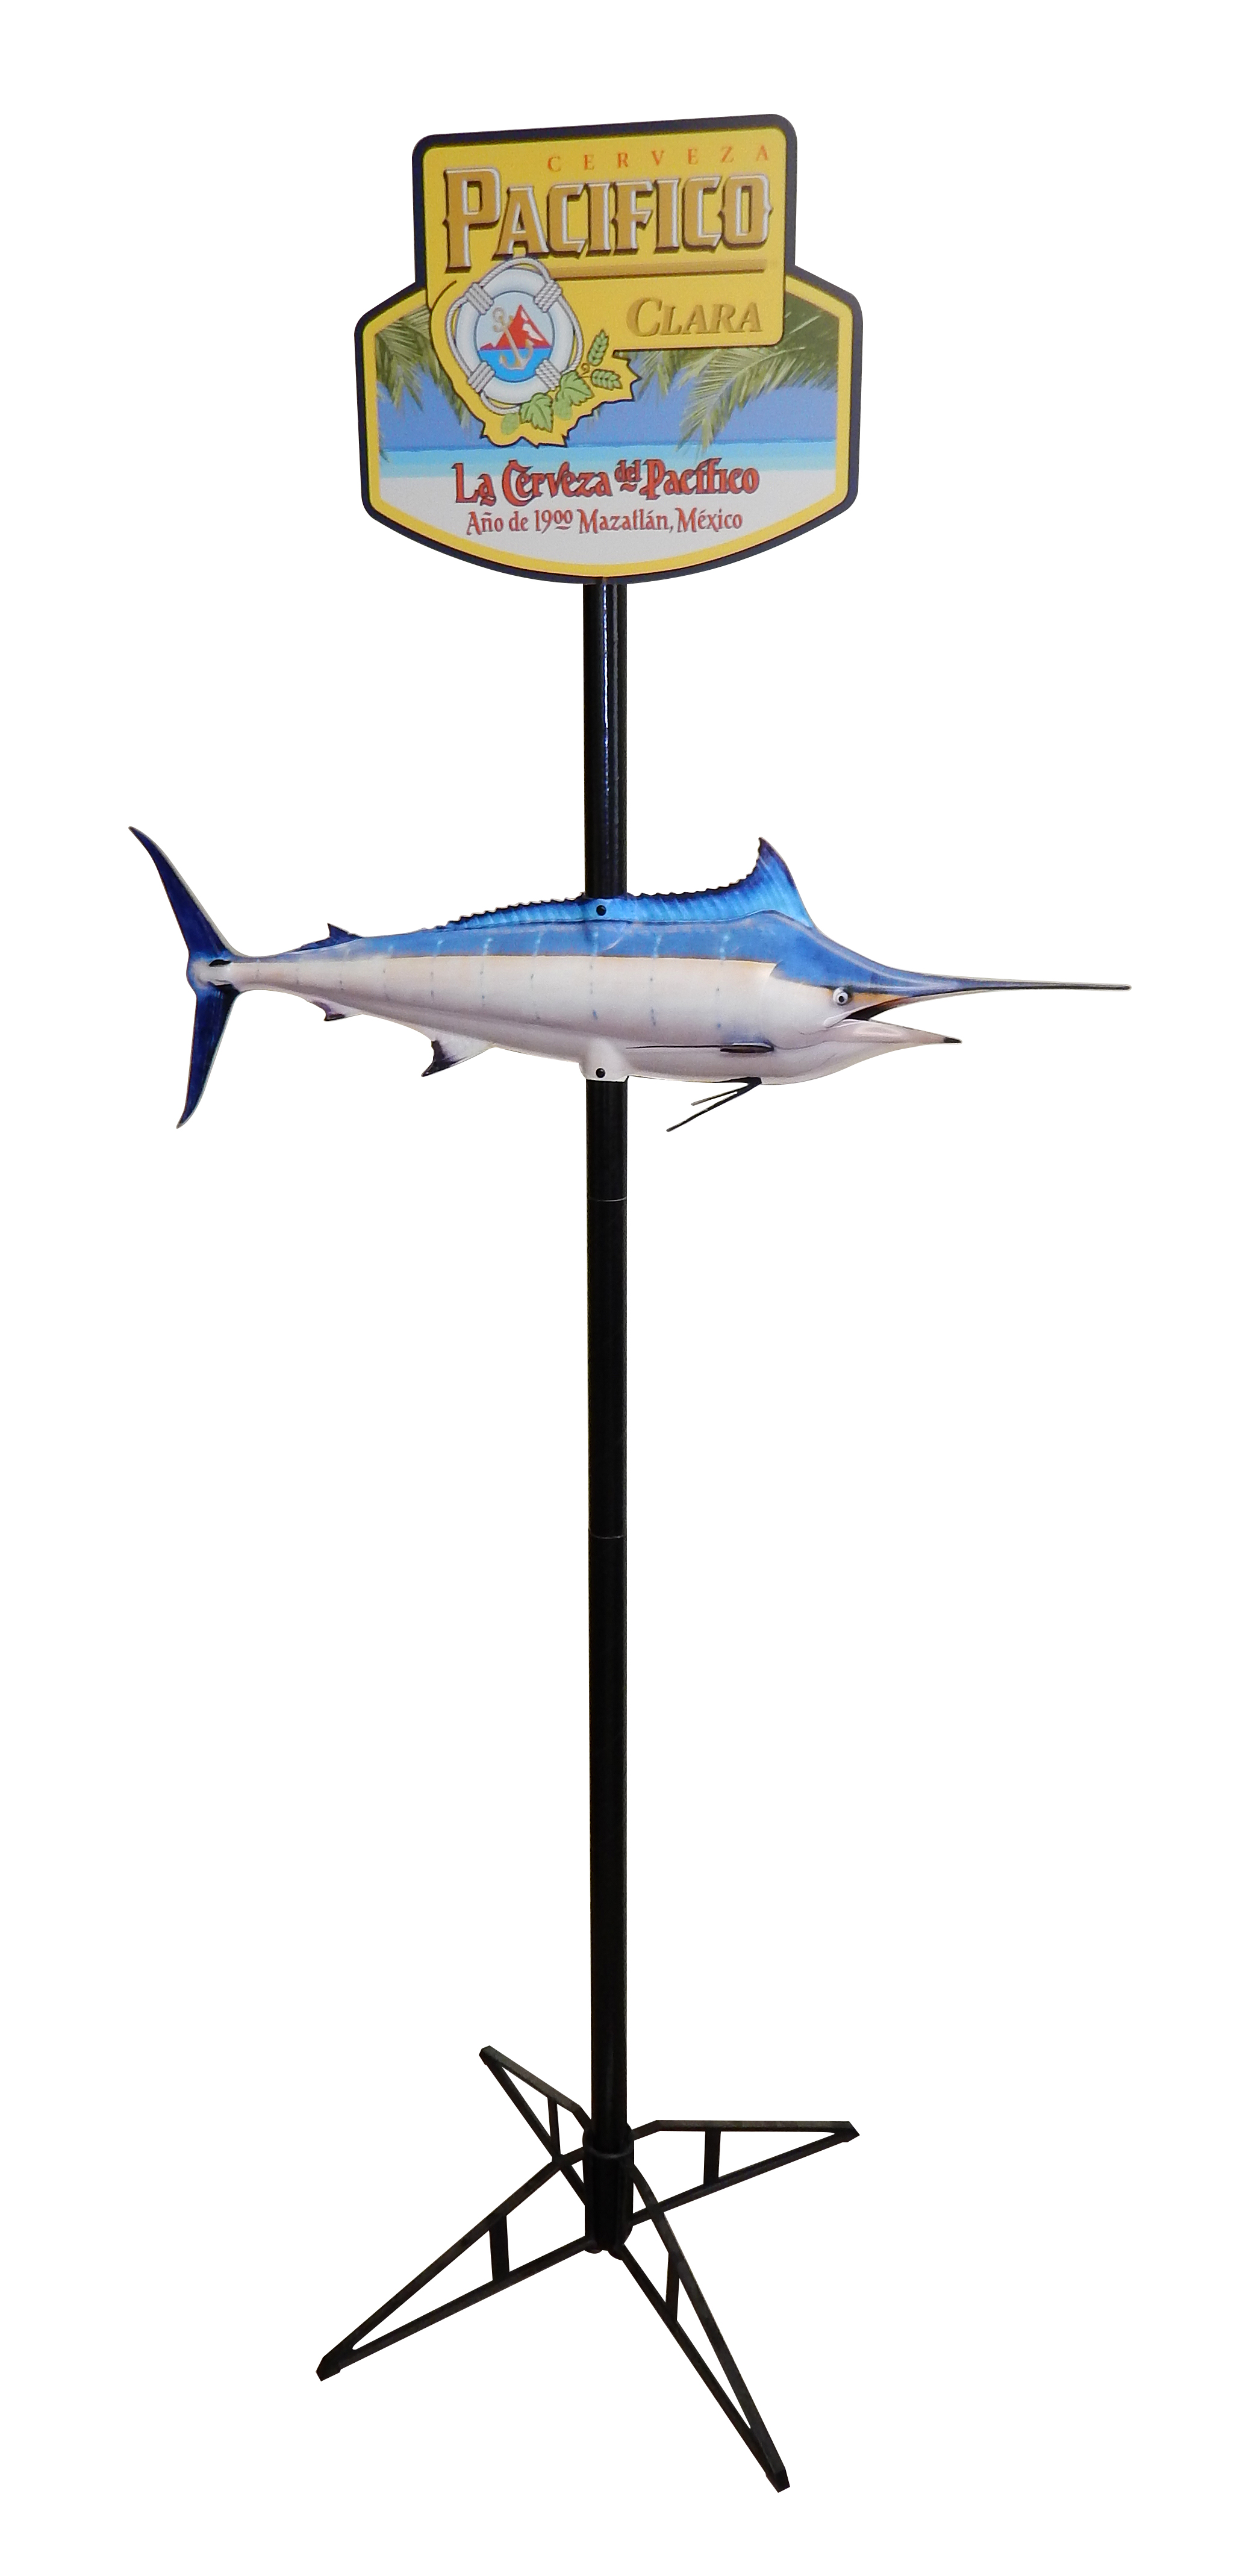 HPS-08 Pacifico Marlin Pole Topper 3739.